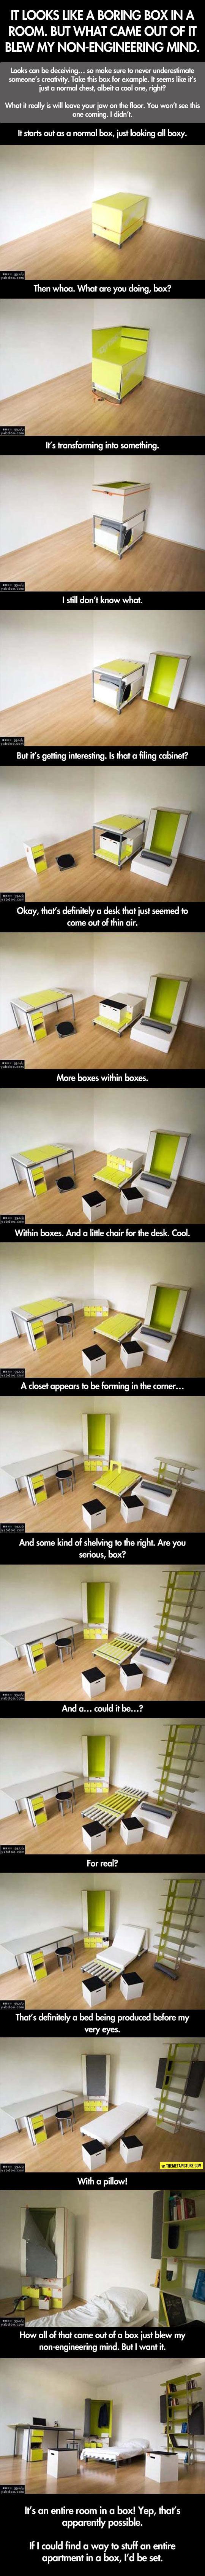 DIY-box-room-creativity-empty